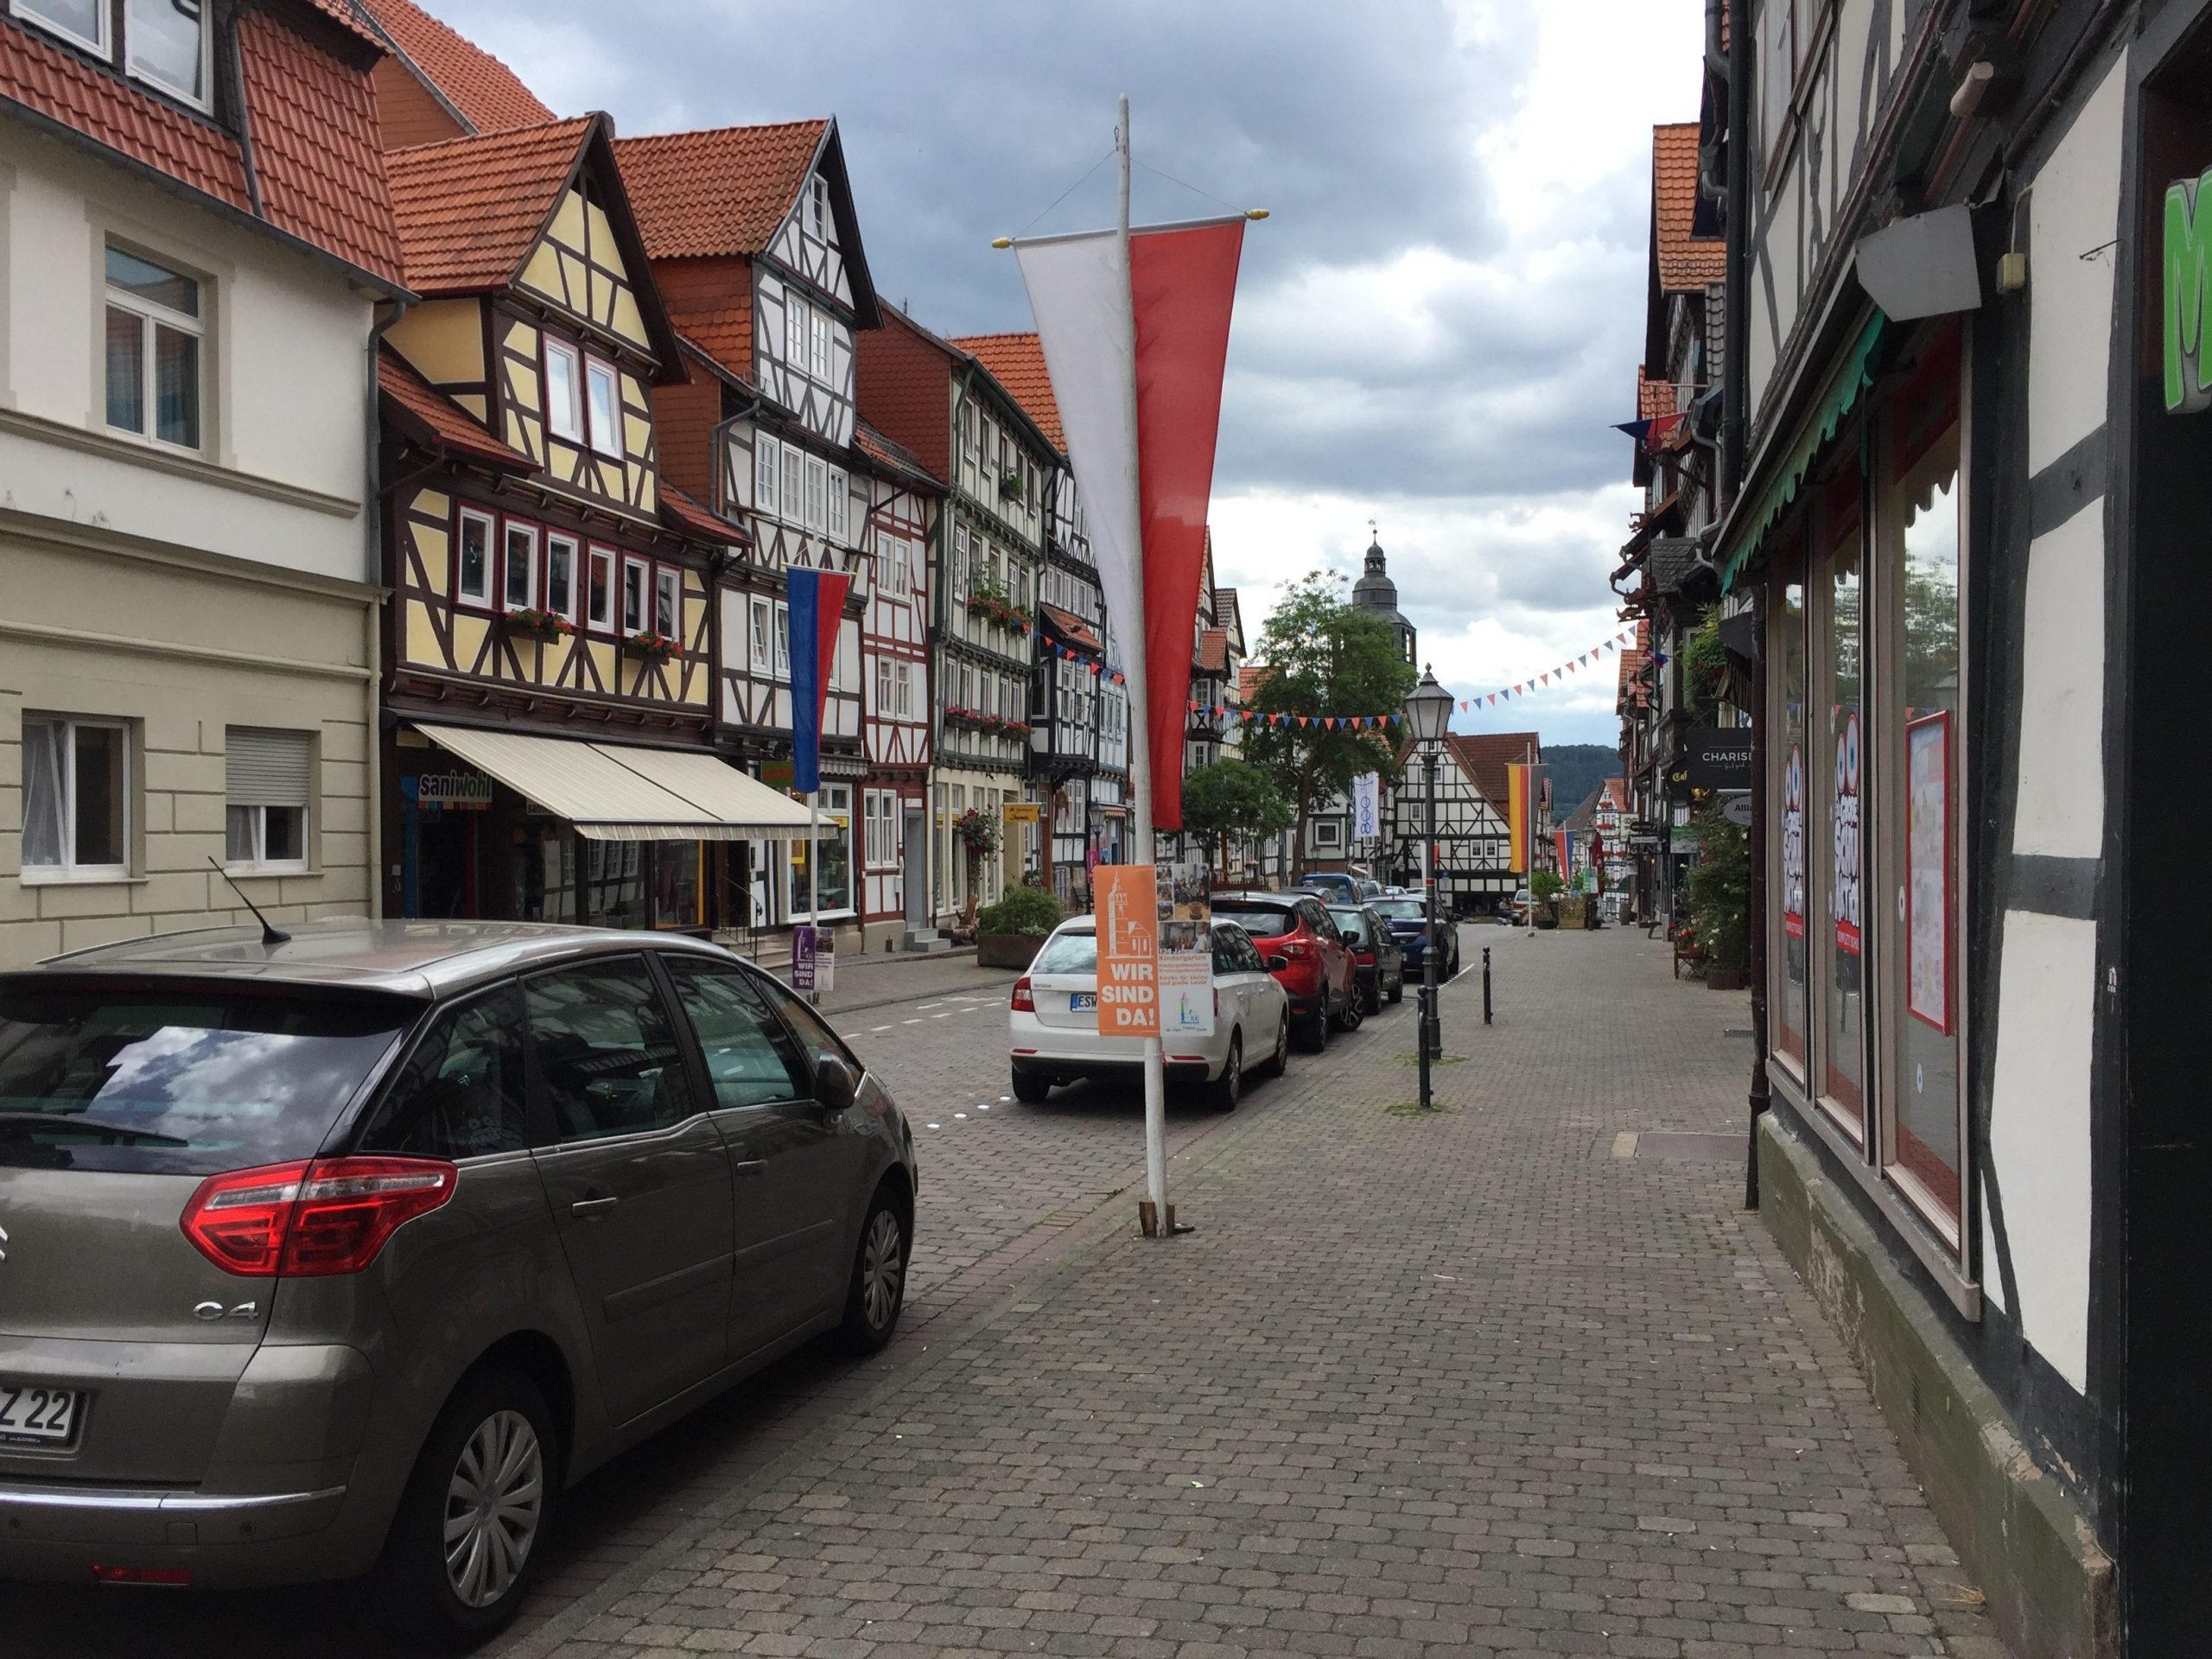 Fachwerk in Bad Sooden-Allendorf